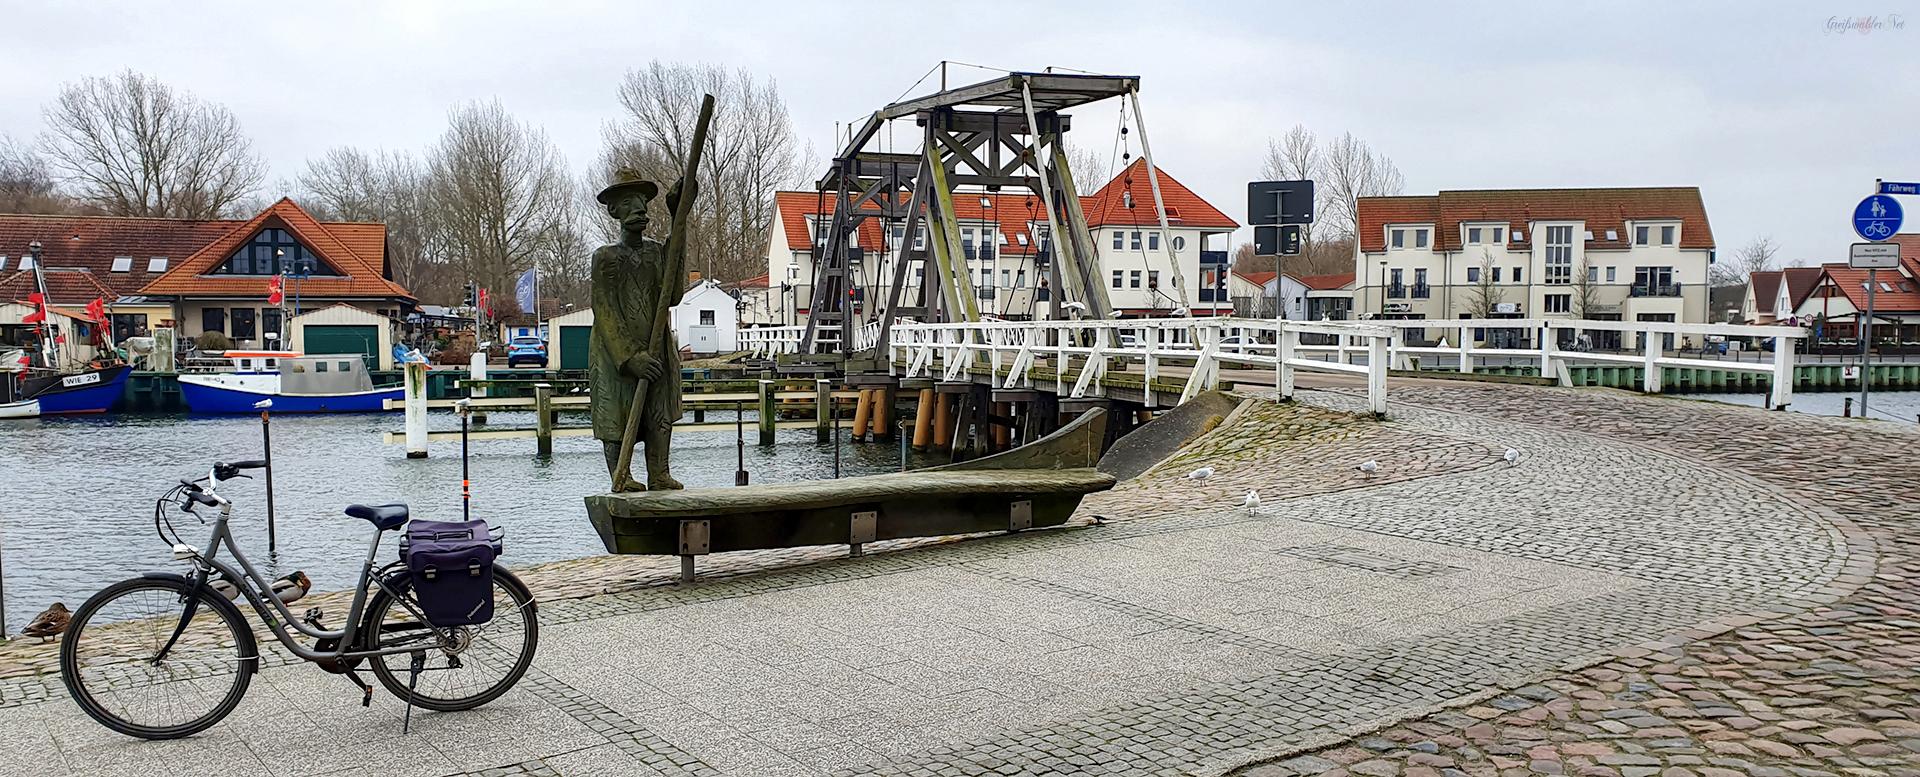 Trüber Tag im Januar an der Brücke in Greifswald-Wieck